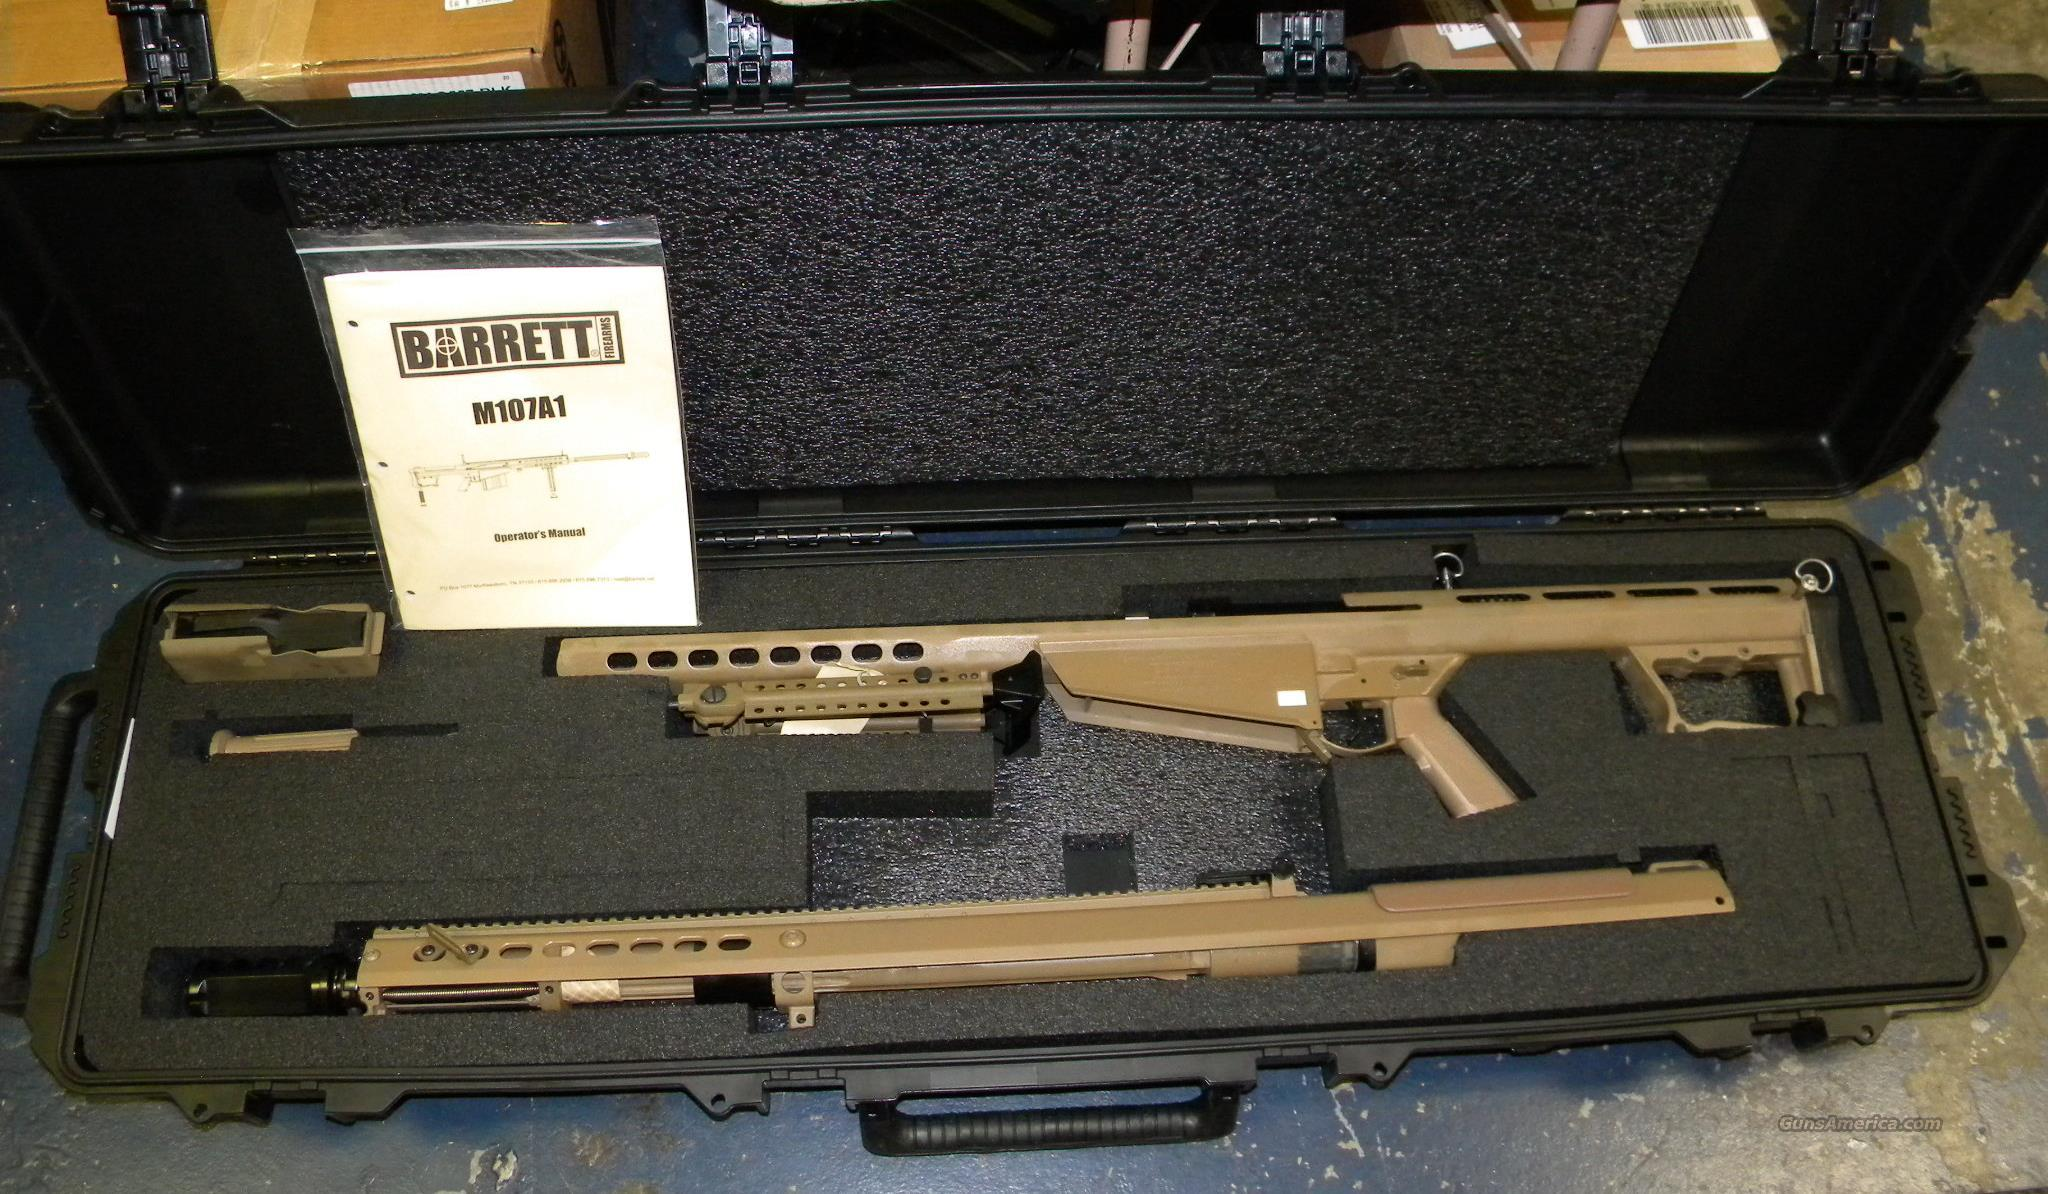 Barrett M107A1  50 BMG In Flat  M107a1 Cq